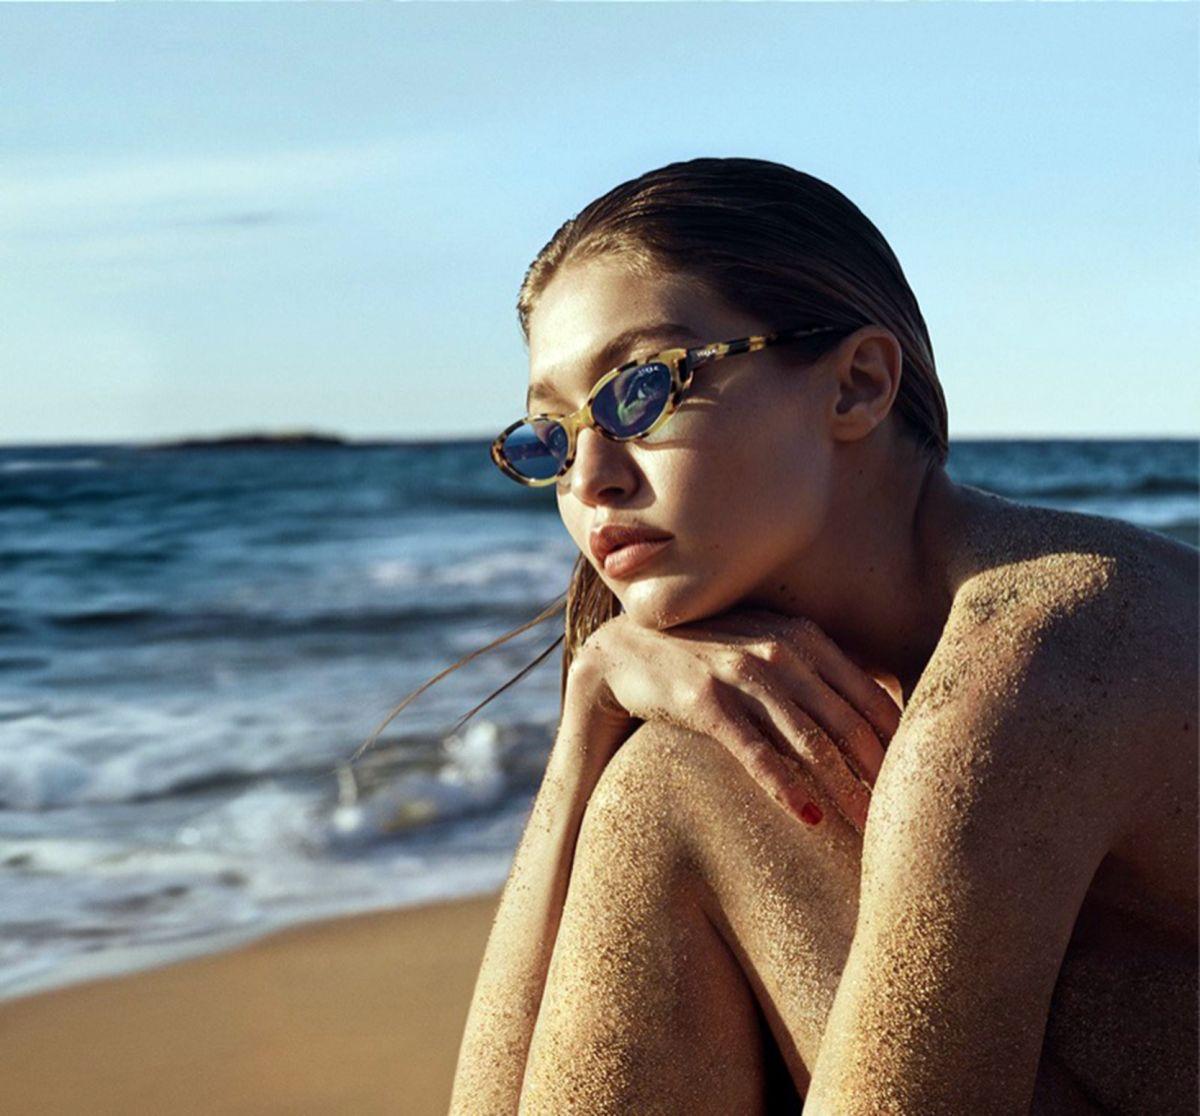 aab637e62c GIGI HADID for Vogue Eyewear Advertising Campaign .